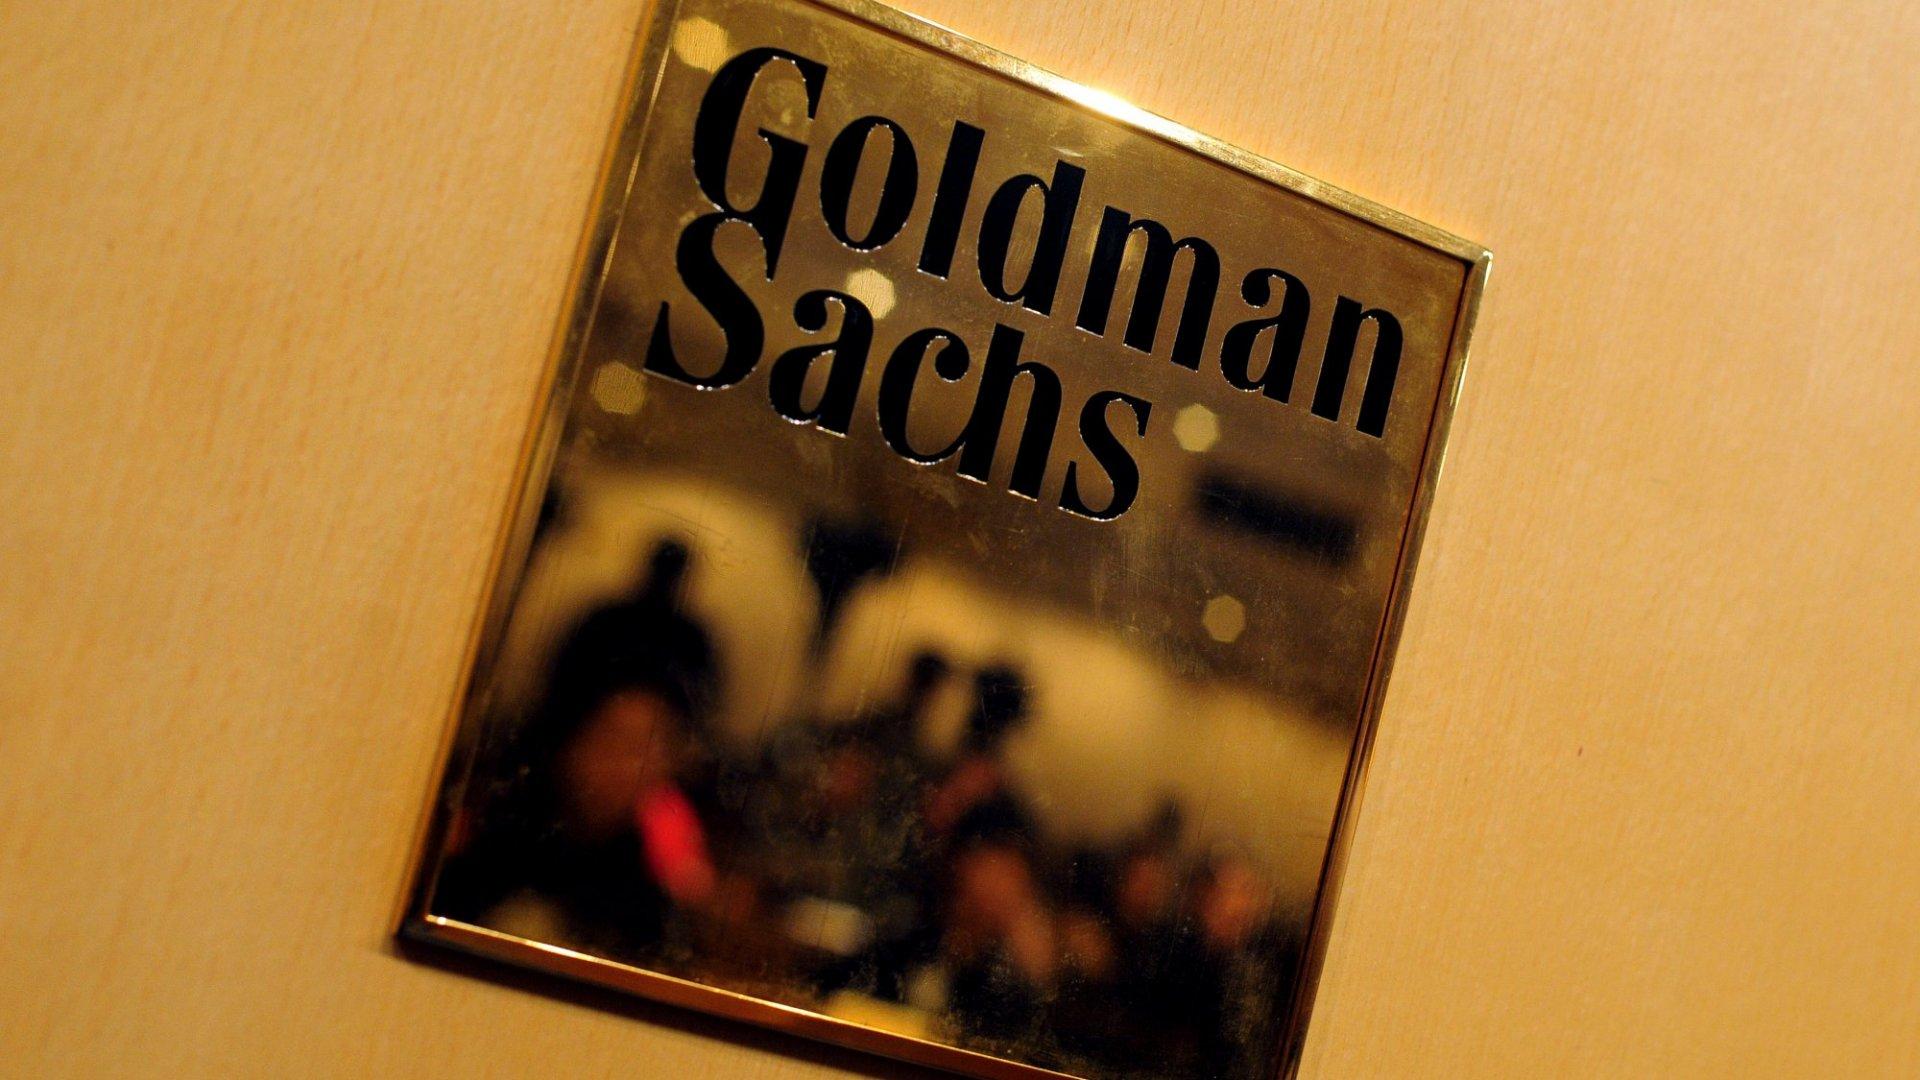 How Goldman Sachs Plans to Disrupt the Disruptors